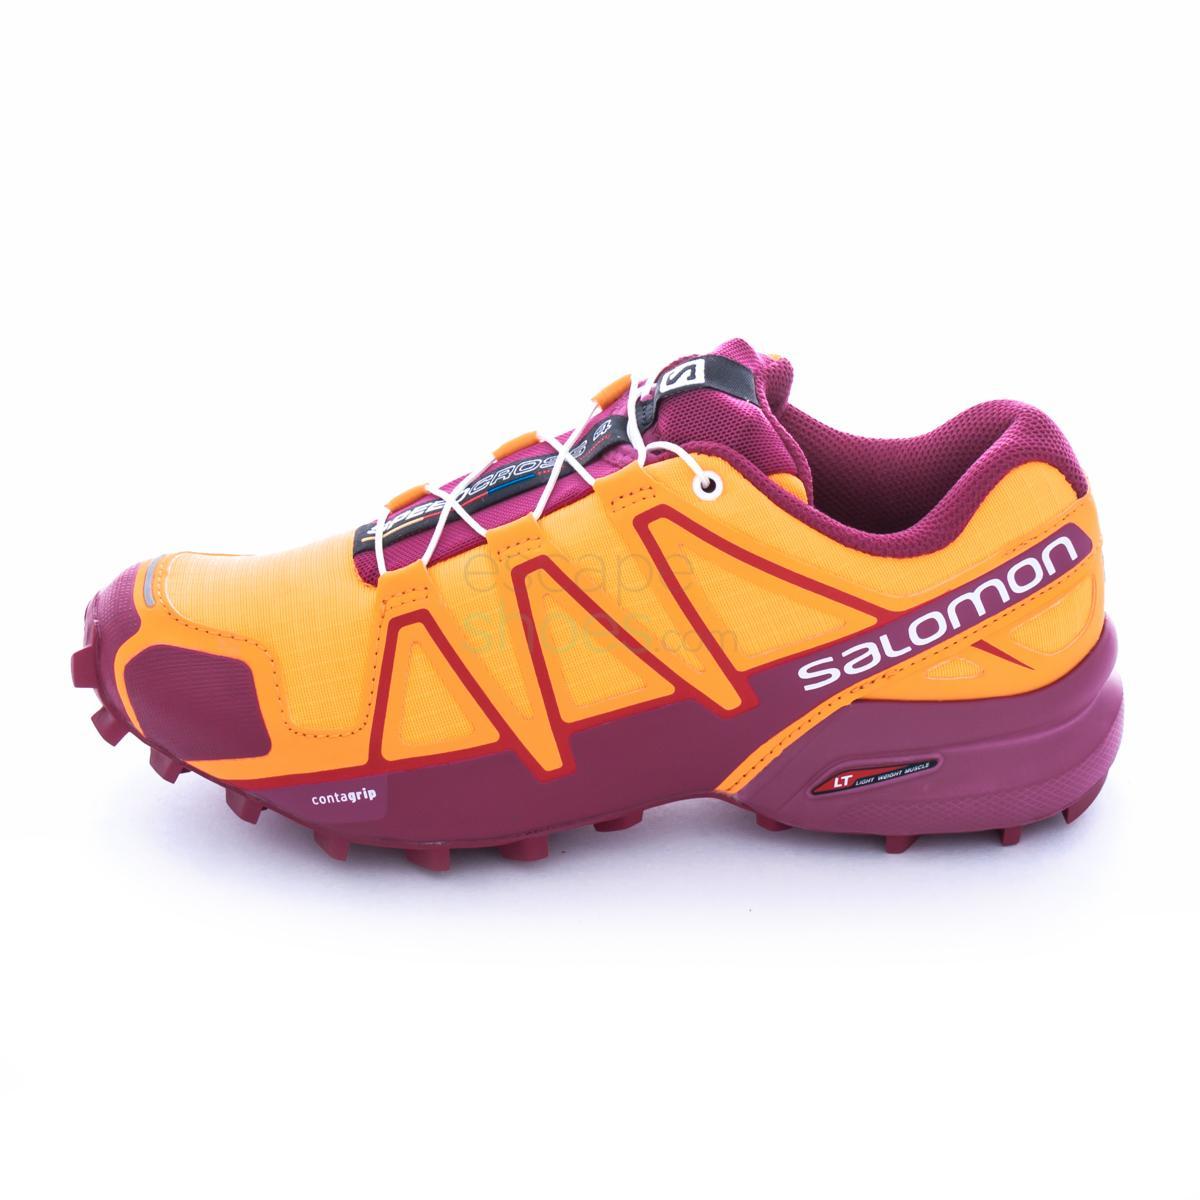 Sneakers SALOMON Speedcross 4 Bright Marigold Sangria 392403